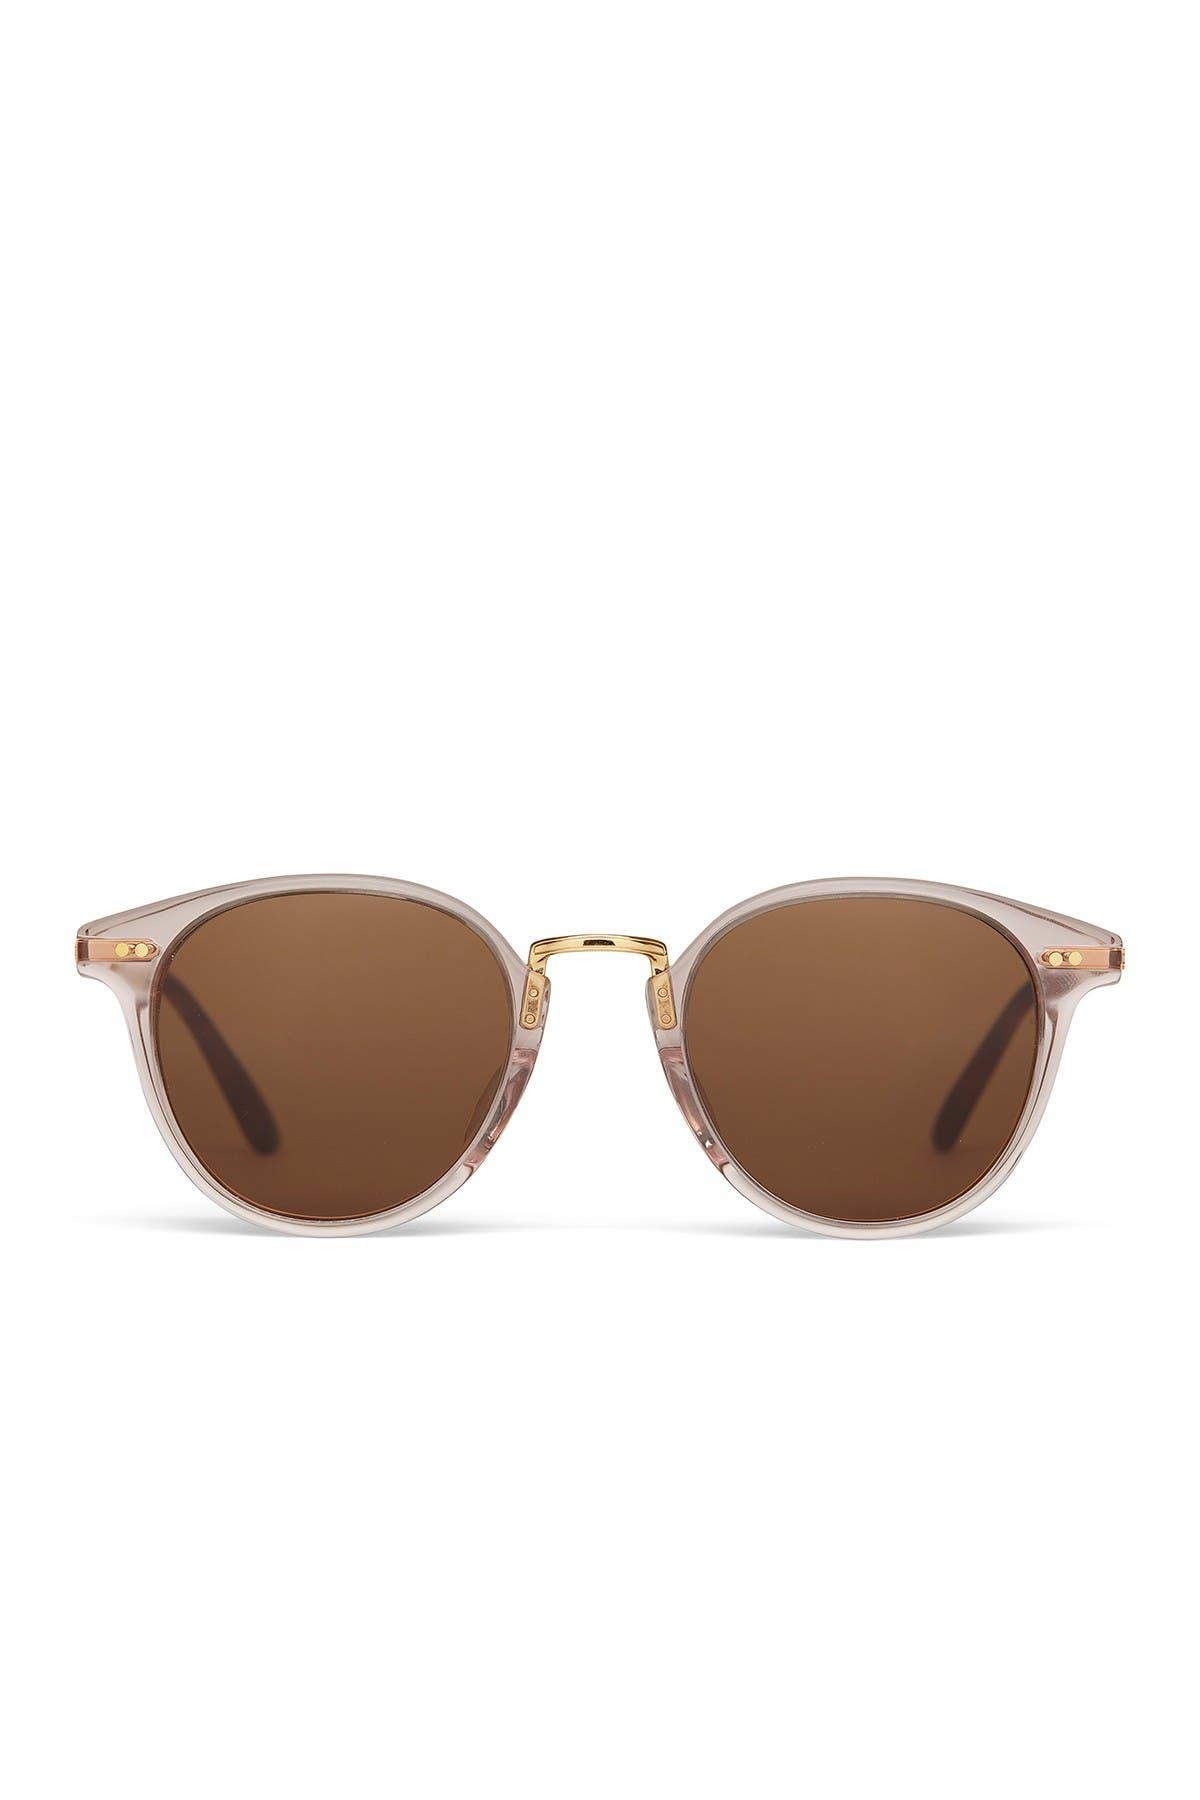 Image of TOMS Bellini 48mm Round Sunglasses